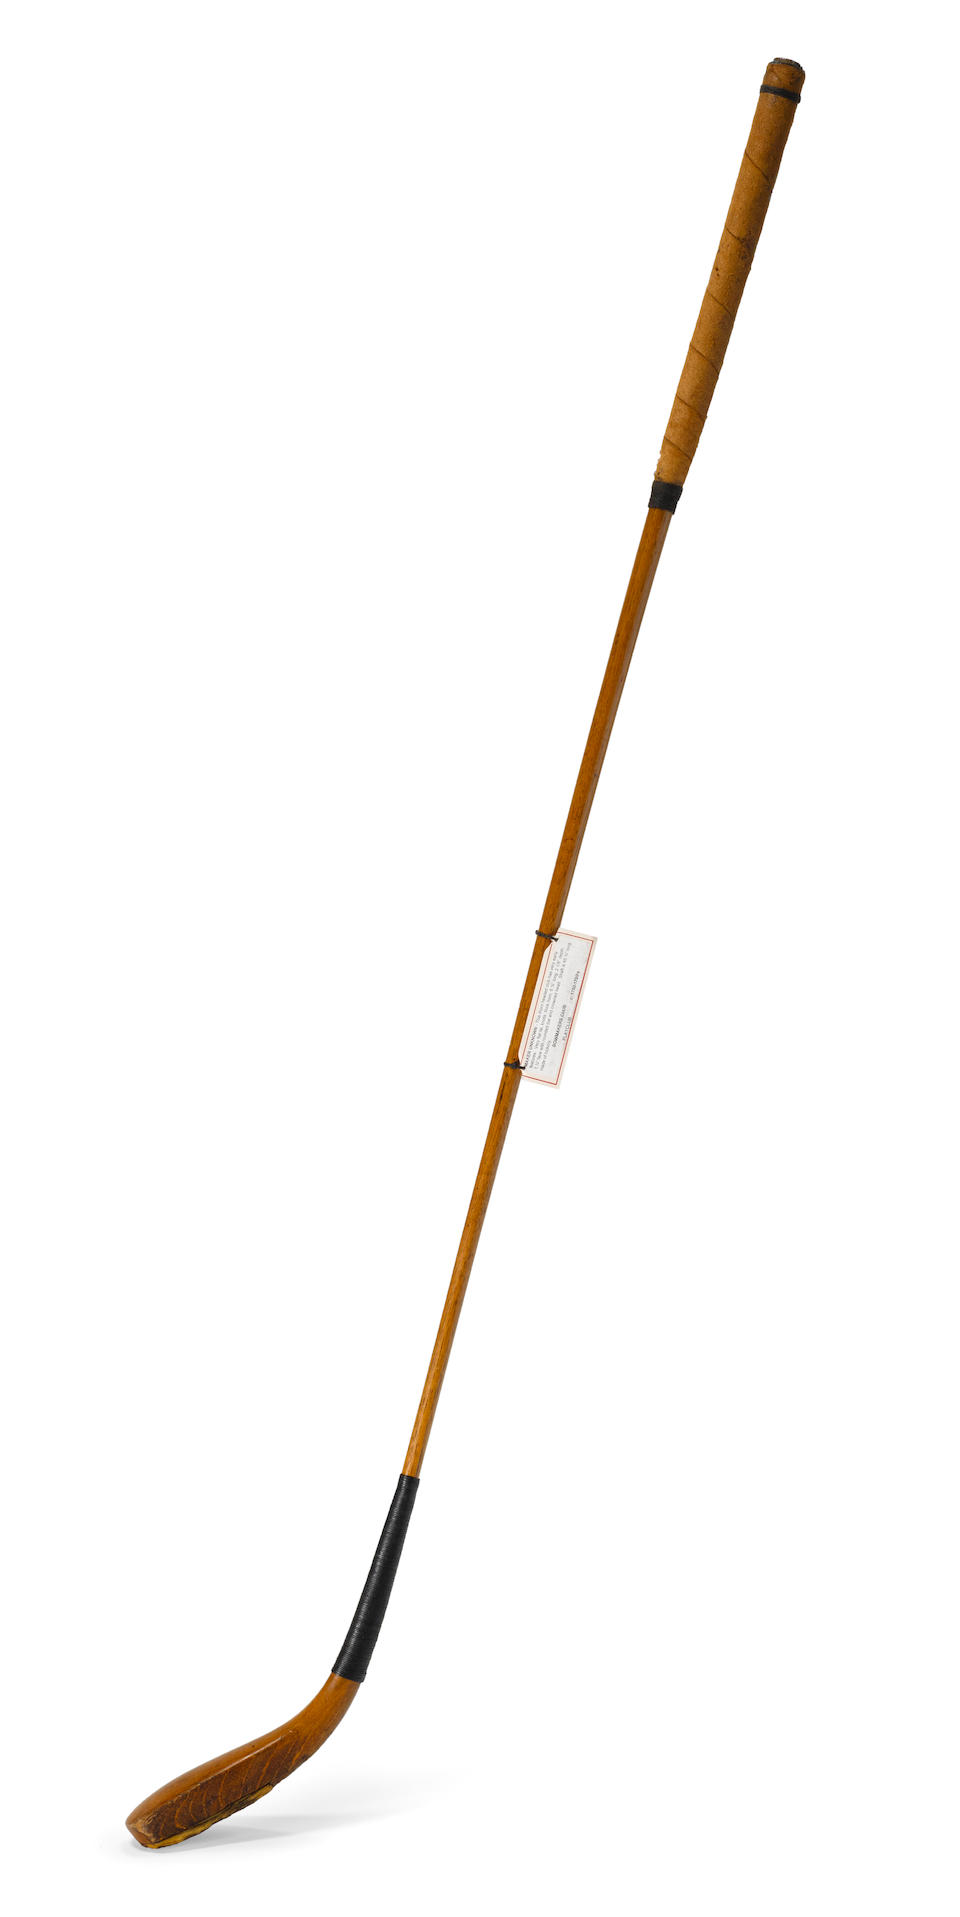 A BOWMAKER'S LONG NOSE PLAY CLUB CIRCA 1750-1780